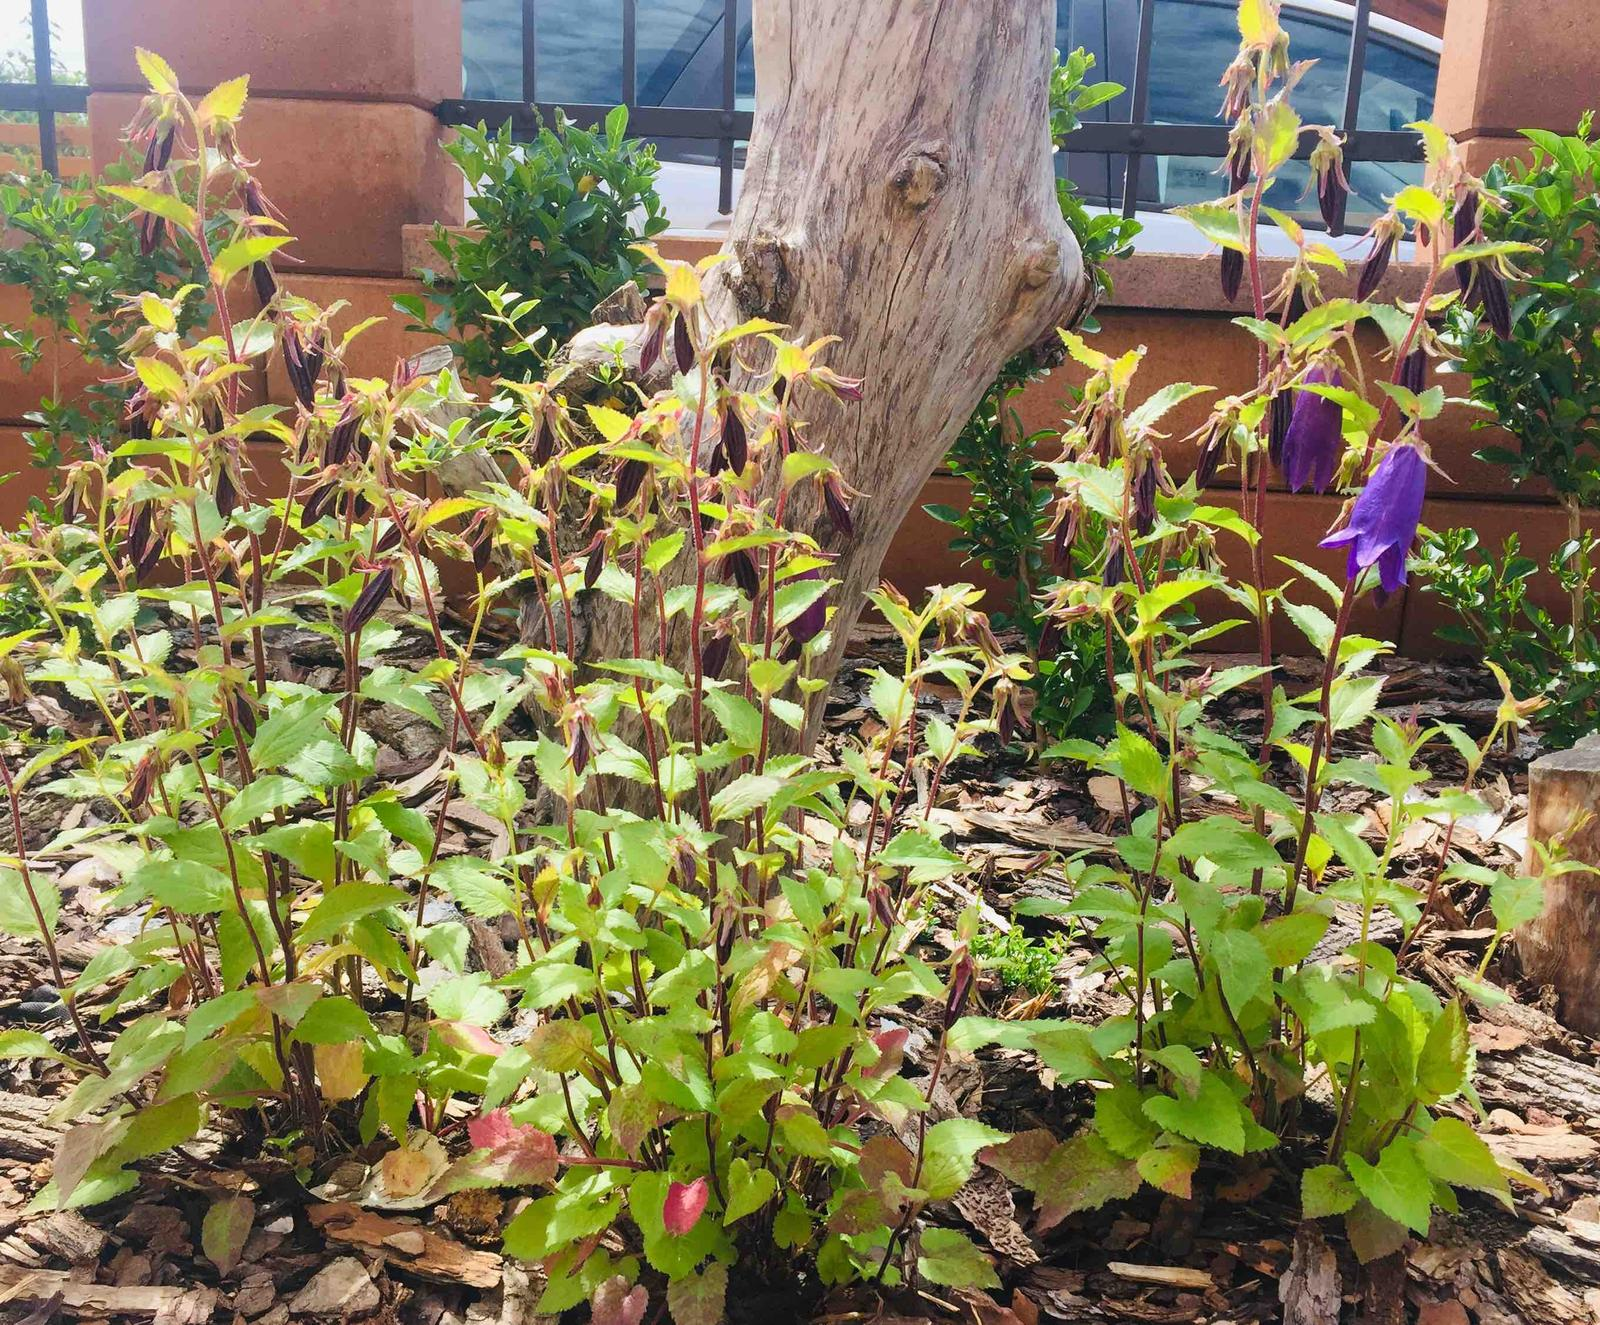 Naše barevná zahrada 🌸 - Zvonek zahradní